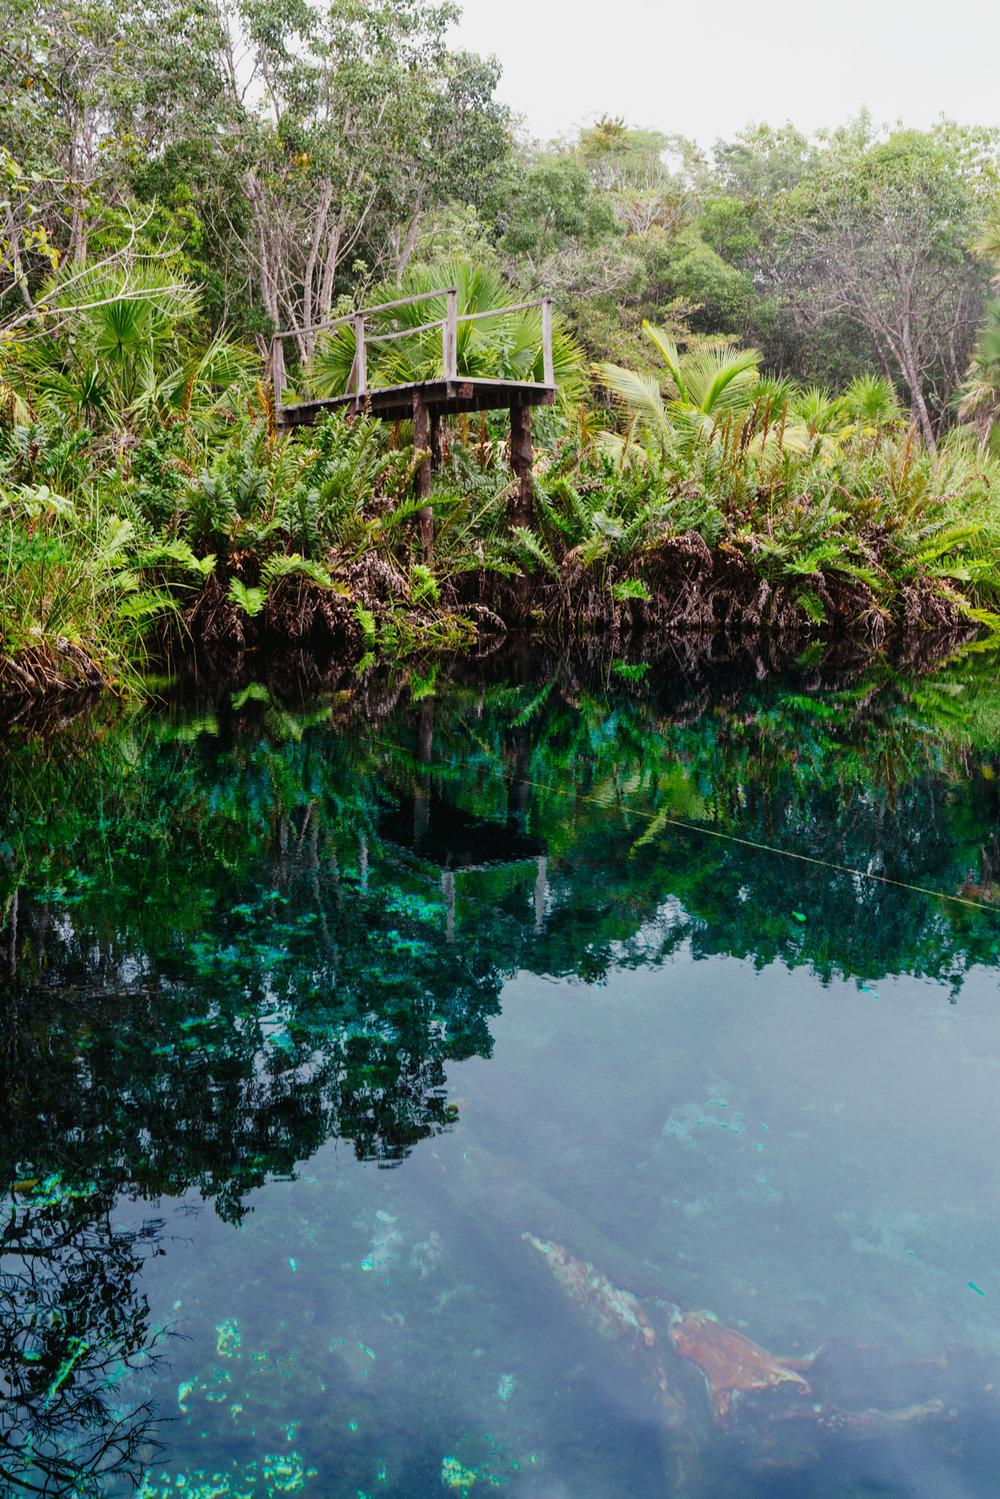 Cenote Cristal submerged tree